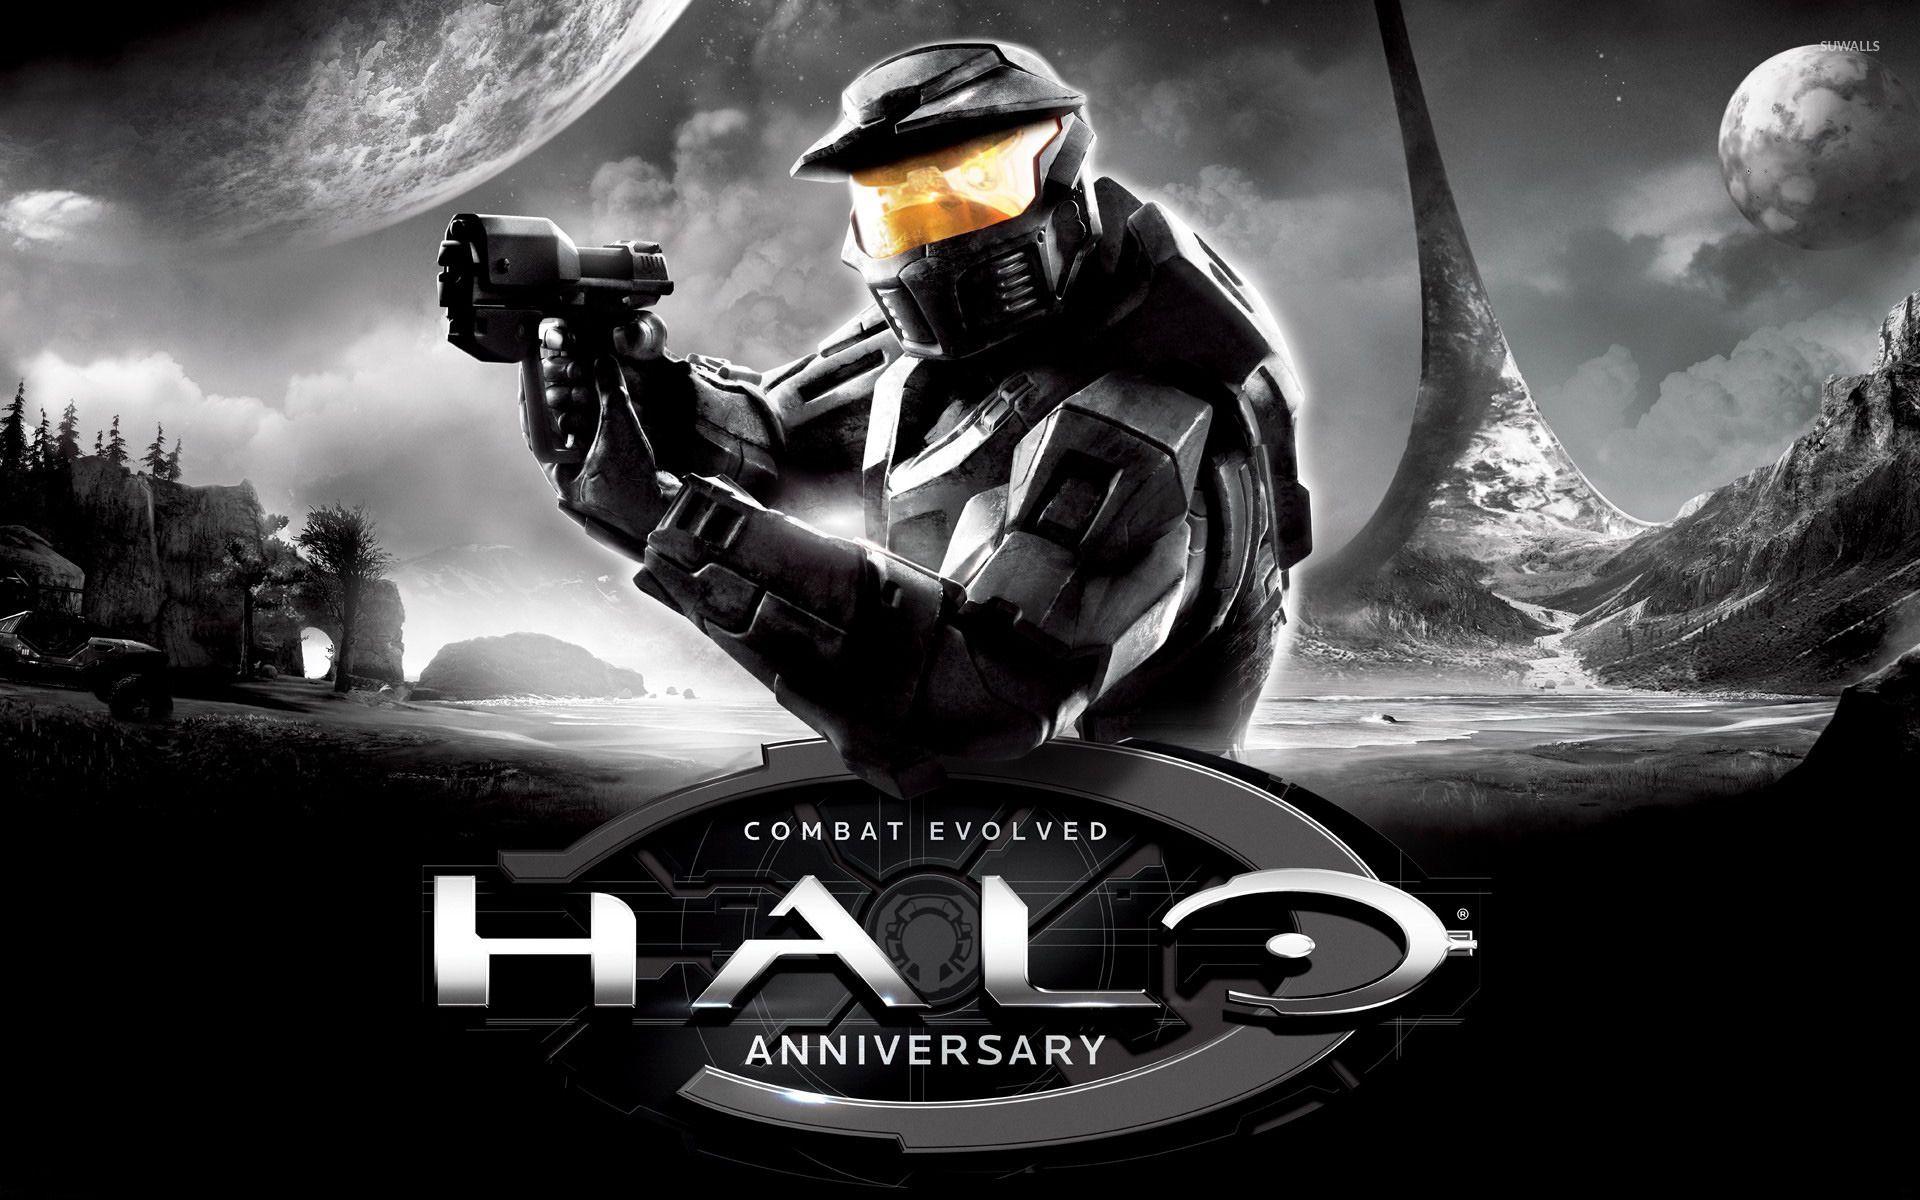 Halo Wars Wallpaper Hd Combat Evolved Halo Game Halo Combat Evolved